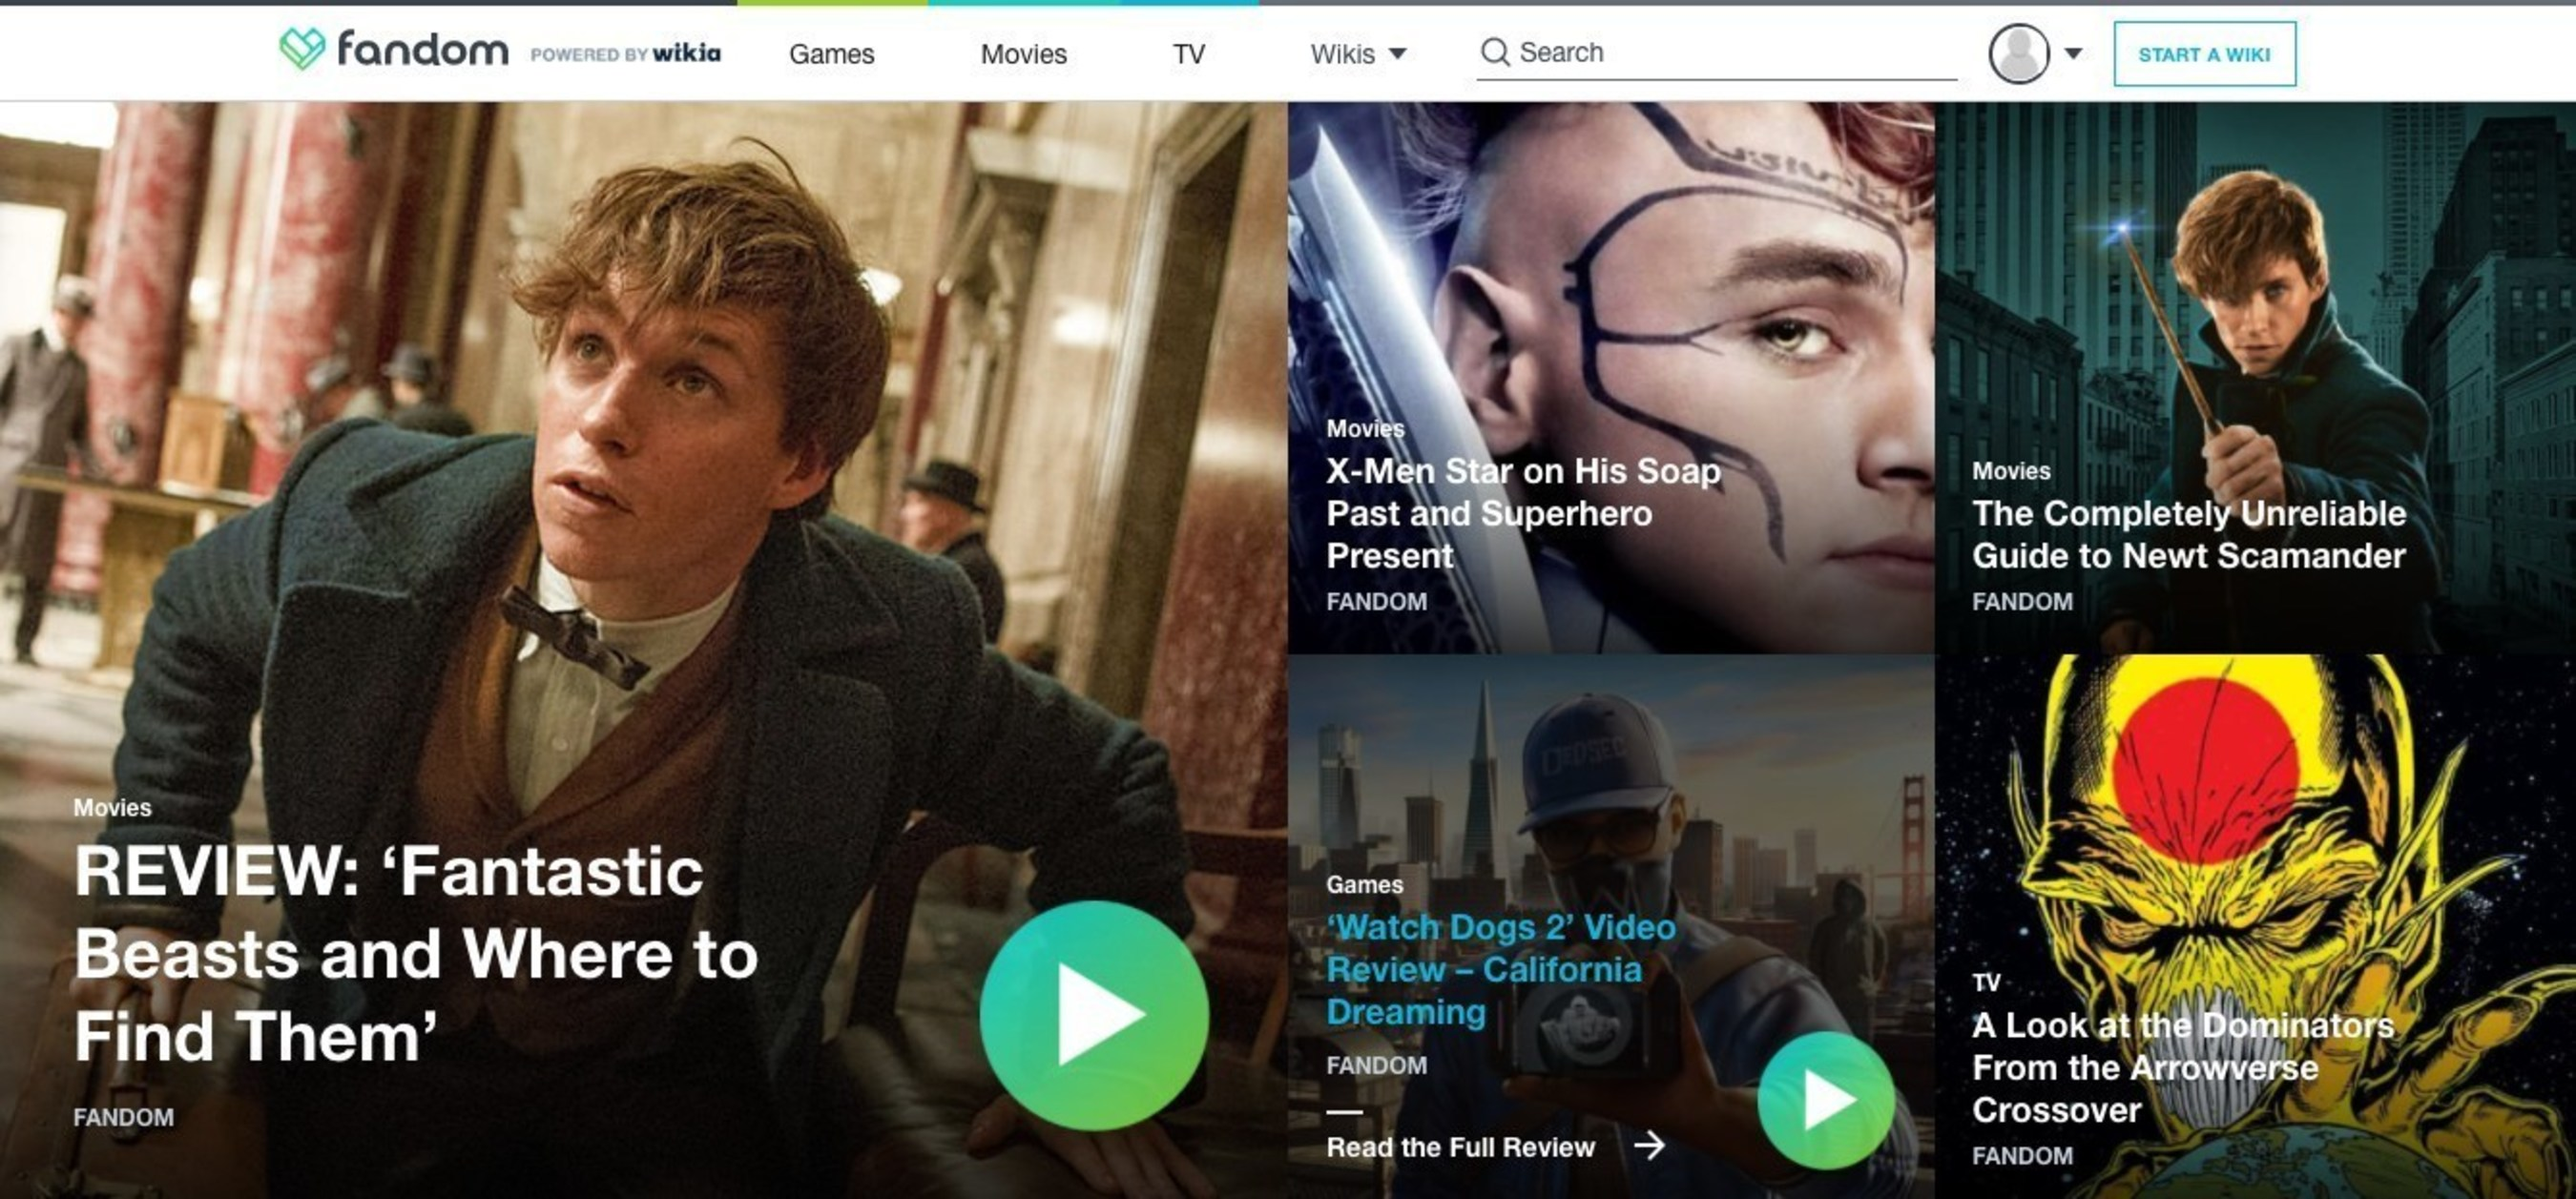 Fandom UK homepage